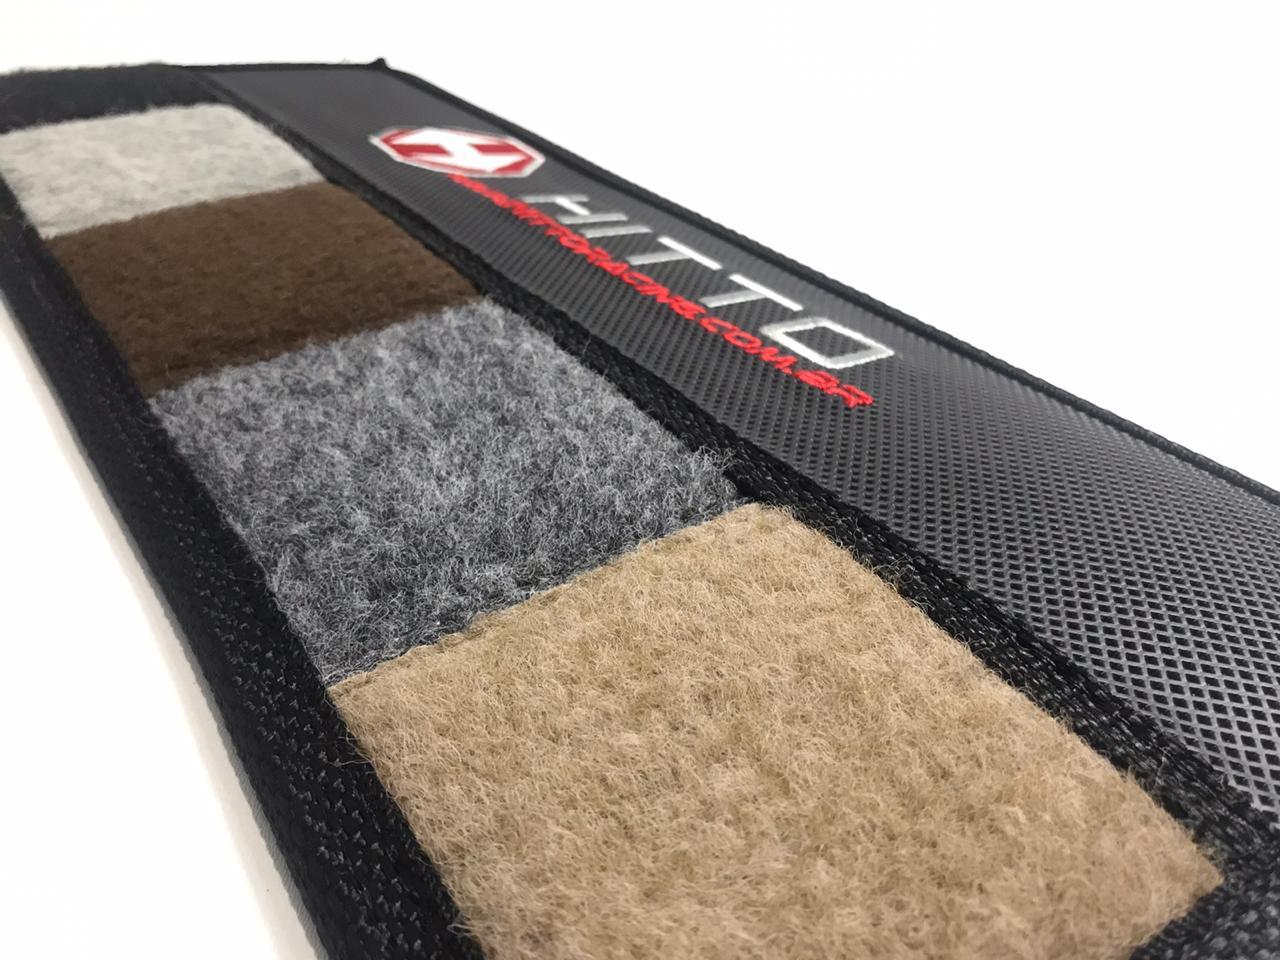 Tapete Malibu Carpete Luxo Base Pinada Hitto O Melhor!